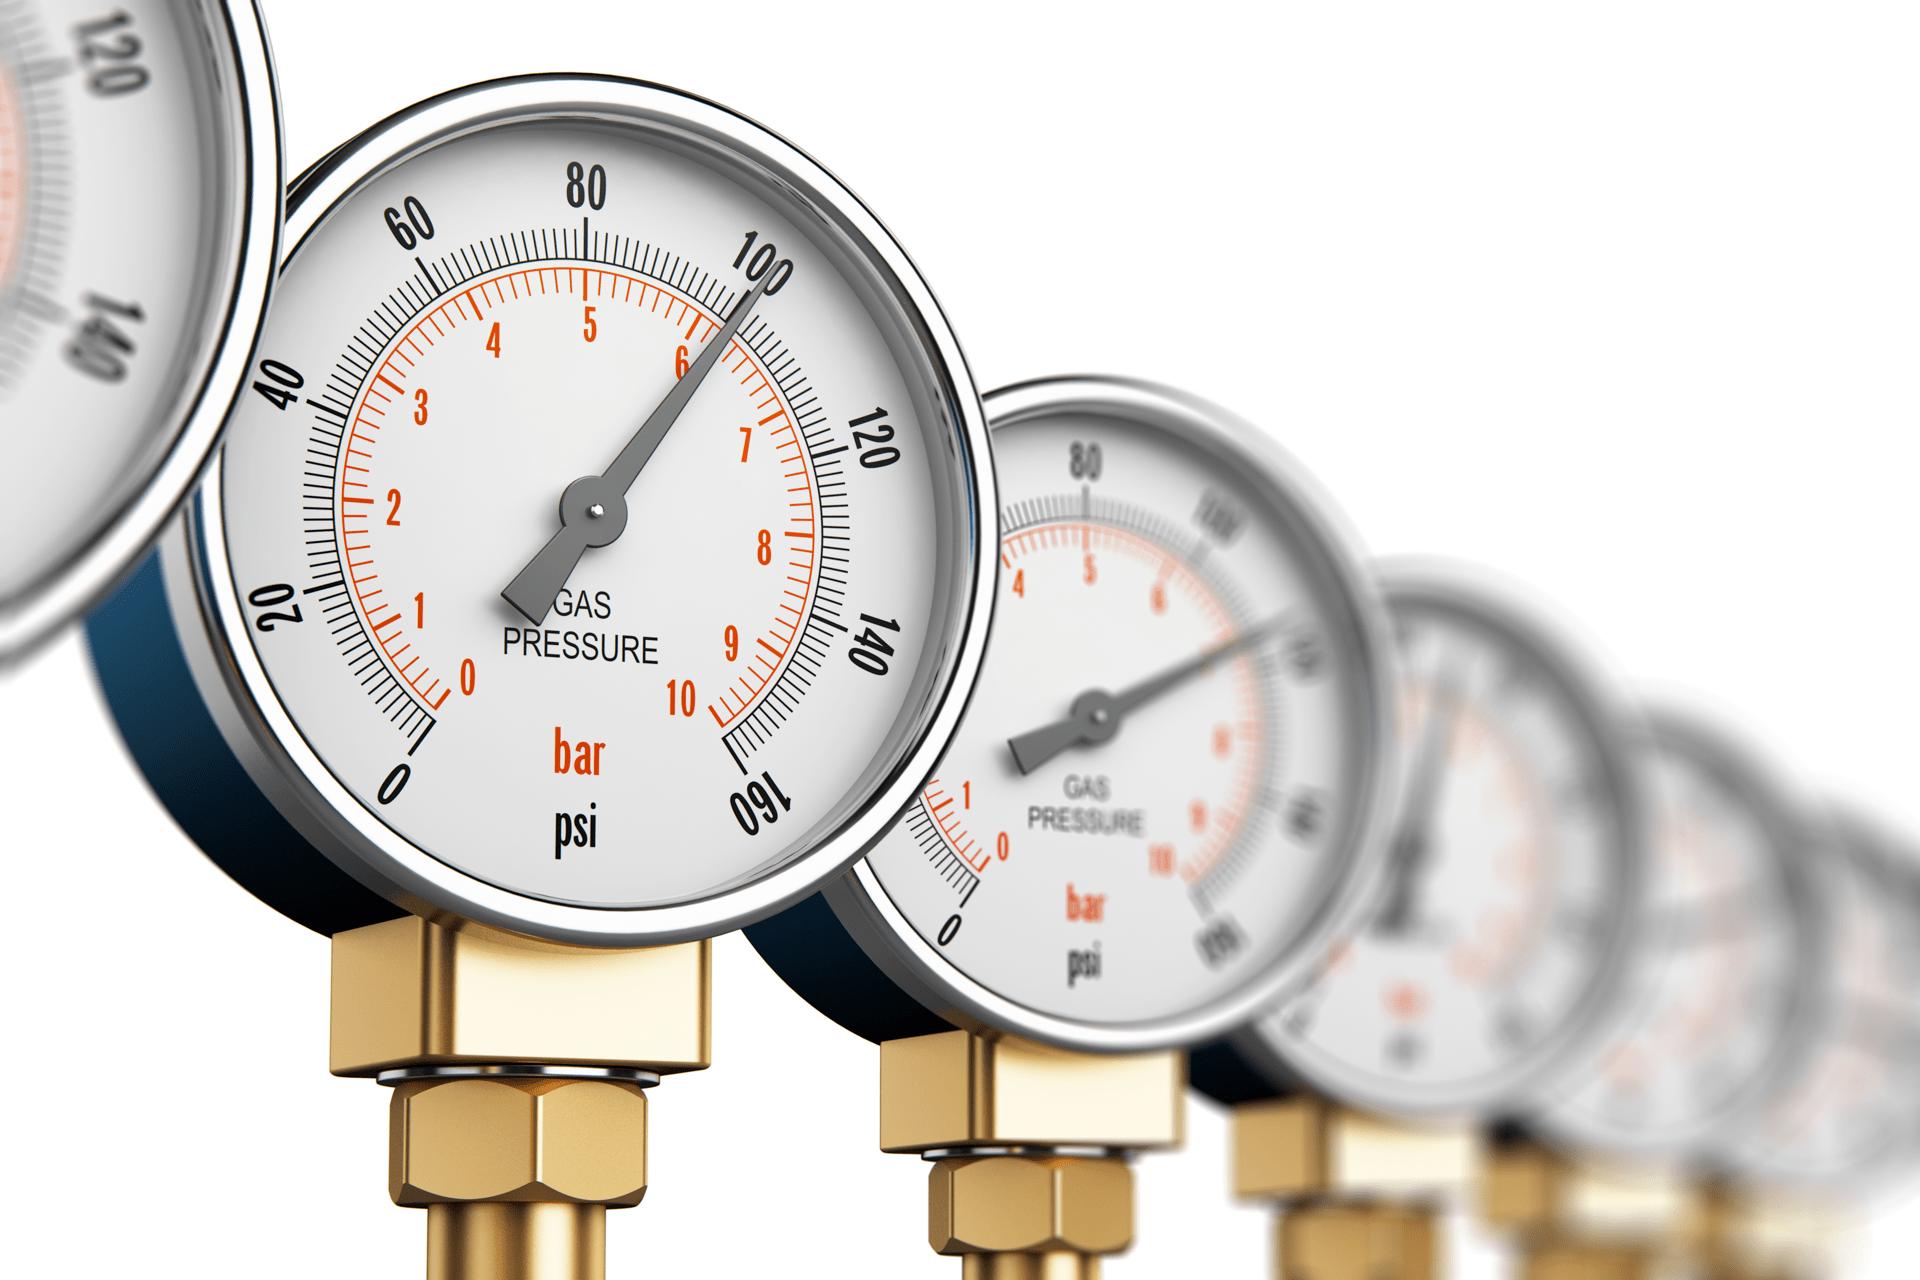 temperature measurement devices